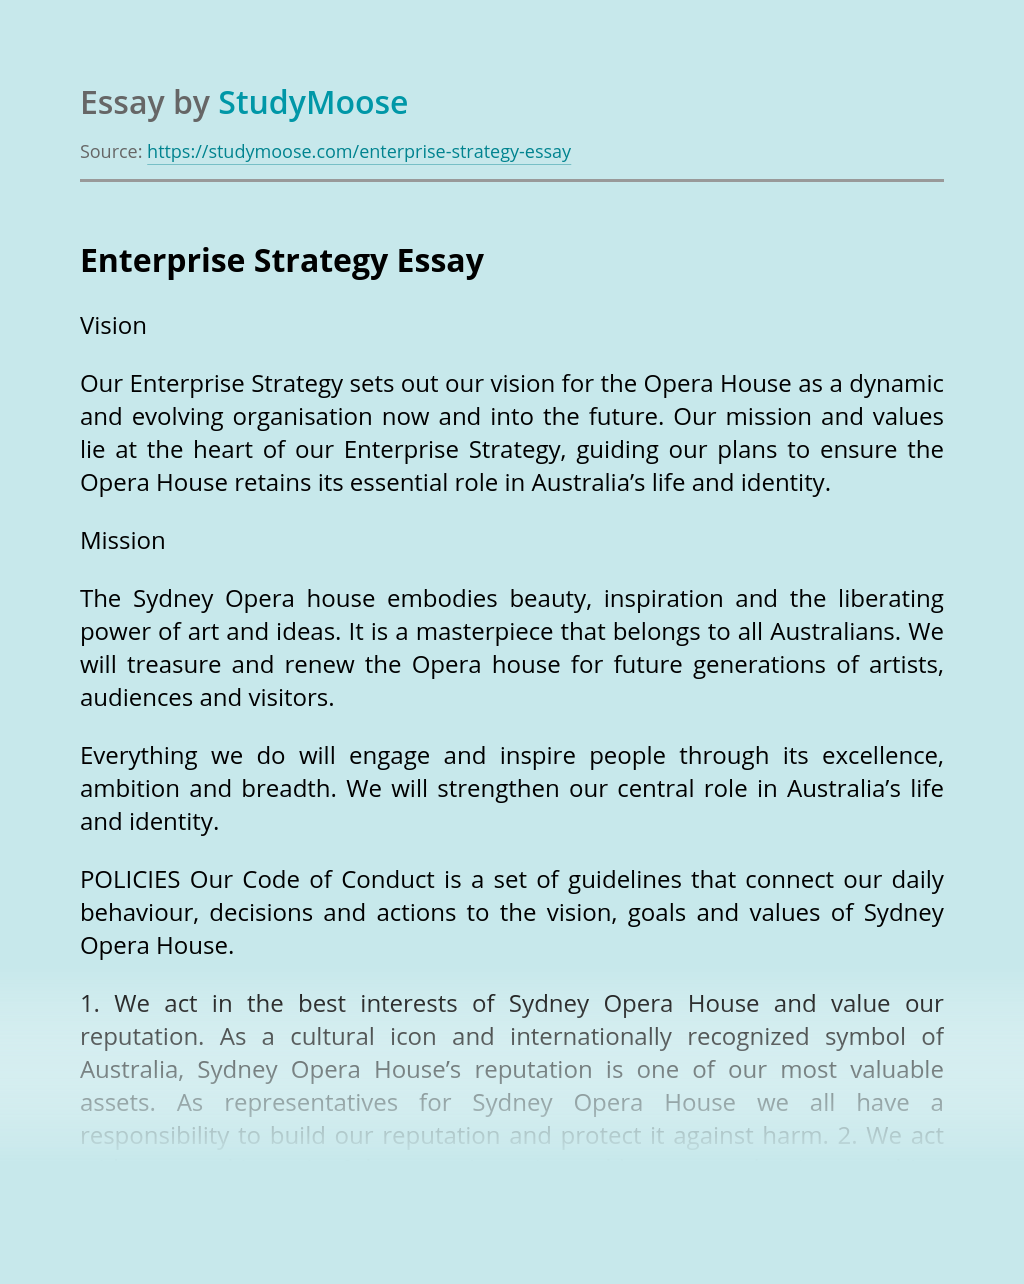 Enterprise Strategy of The Sydney Opera house